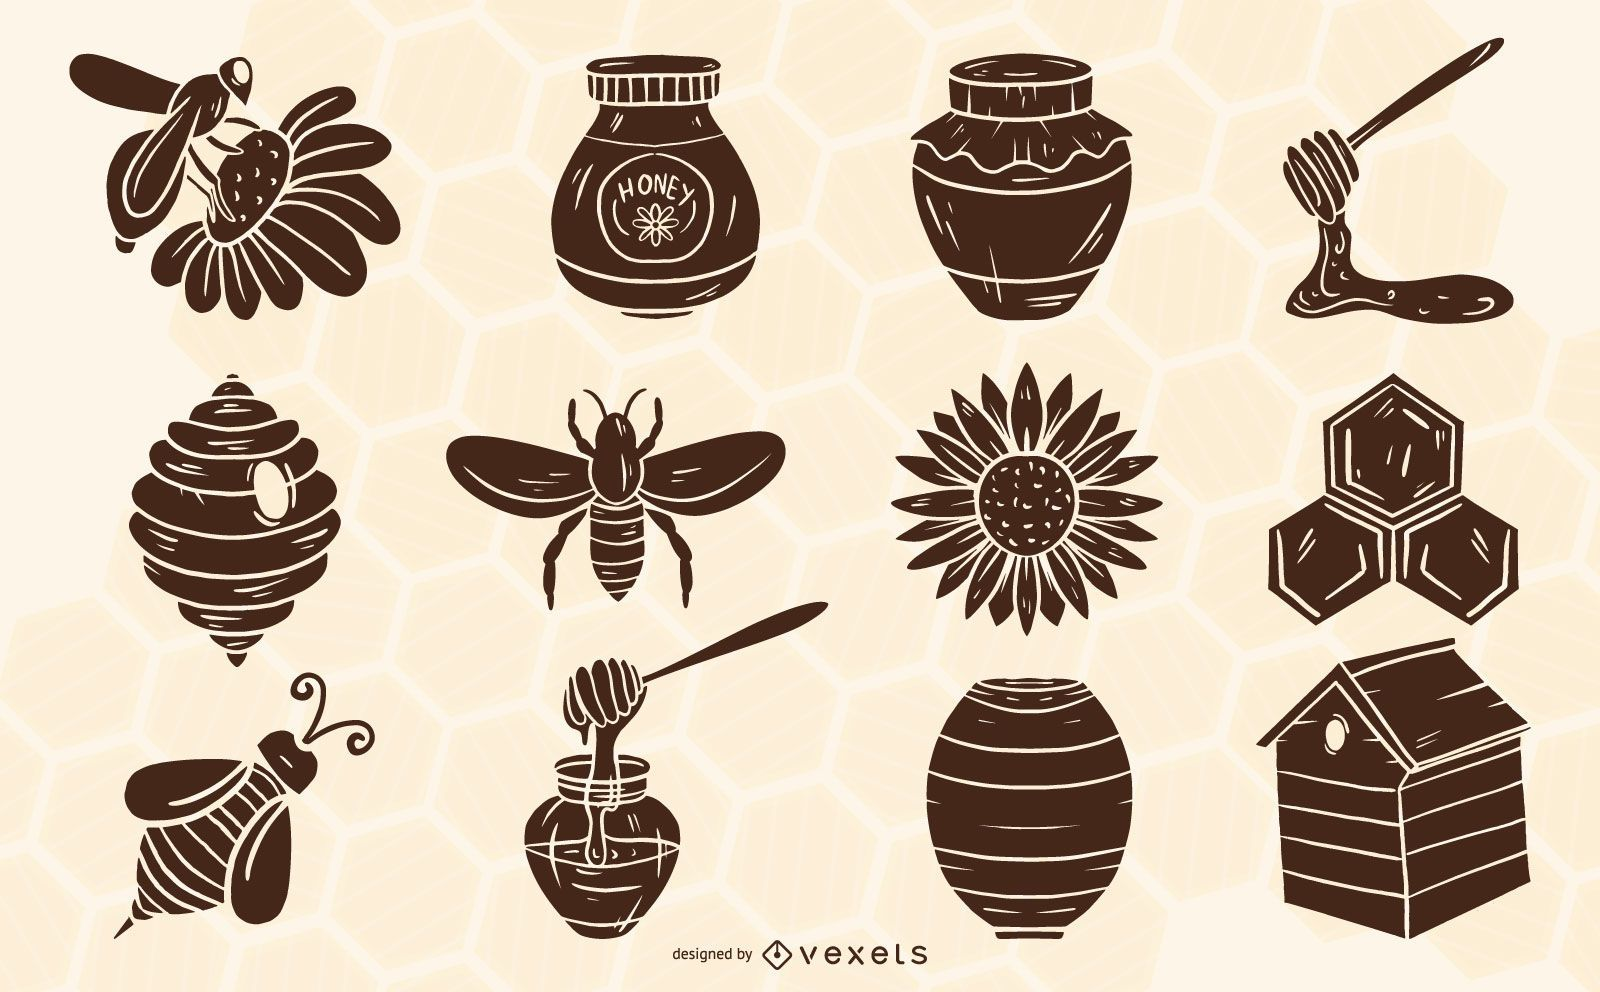 Conjunto de elementos de silueta de apicultura